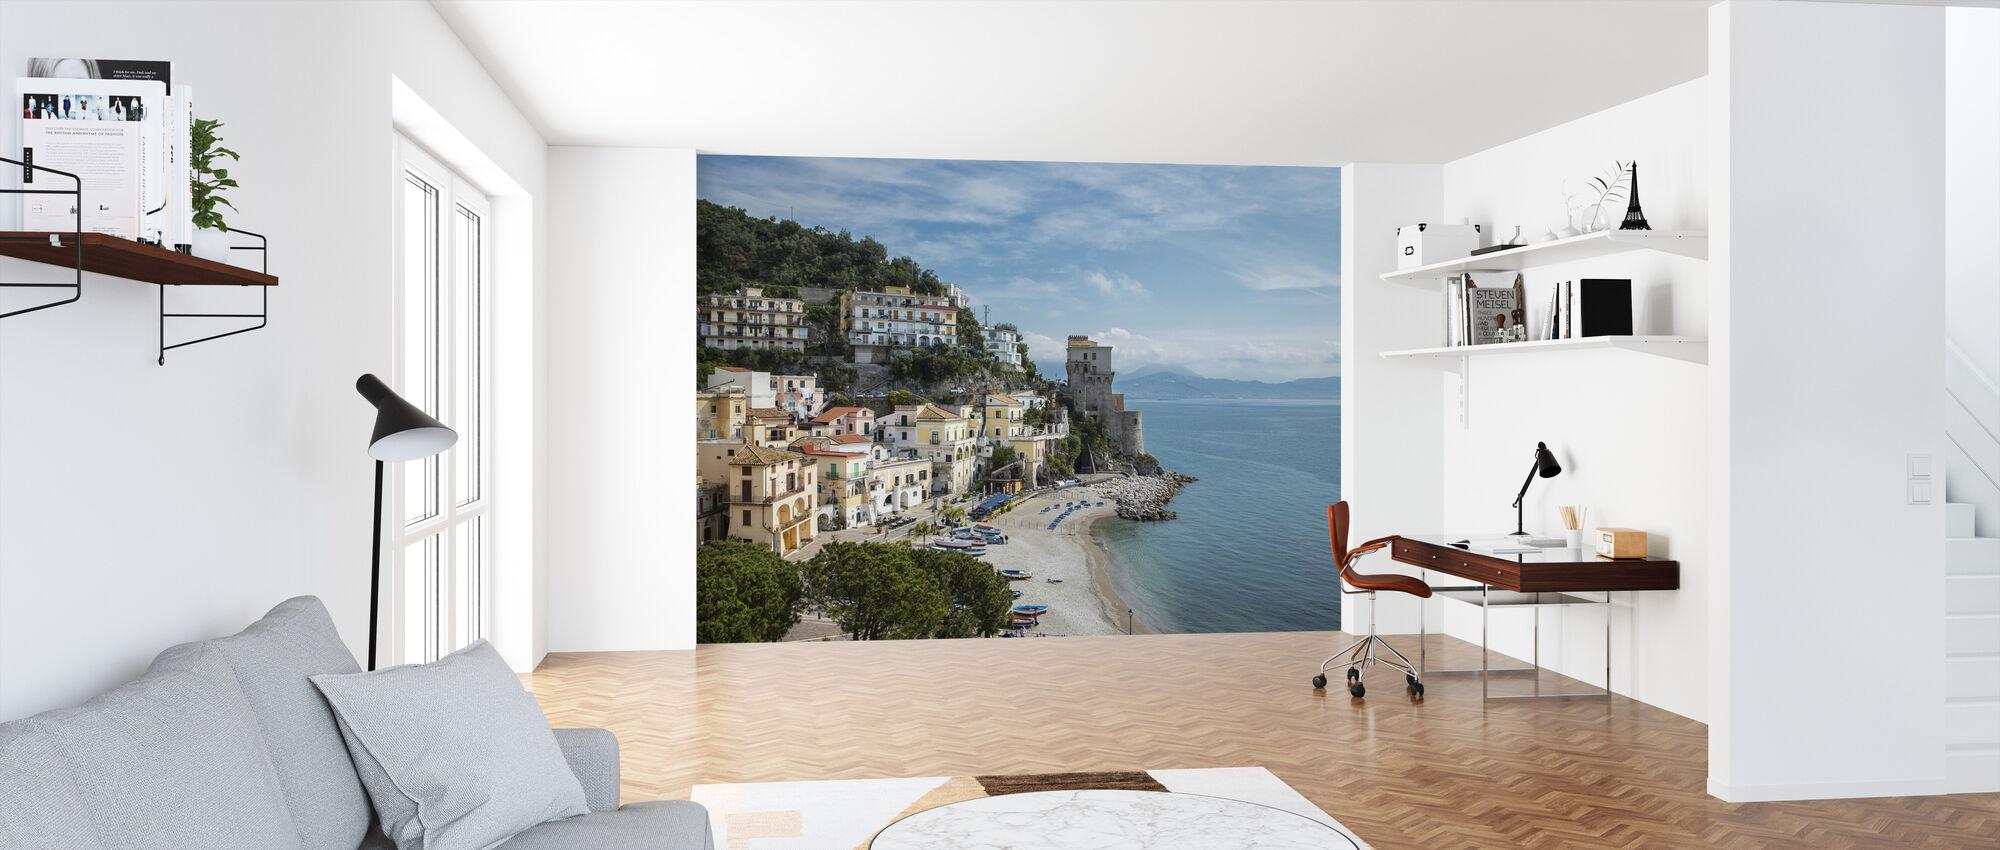 Amalfi Coast - Wallpaper - Office